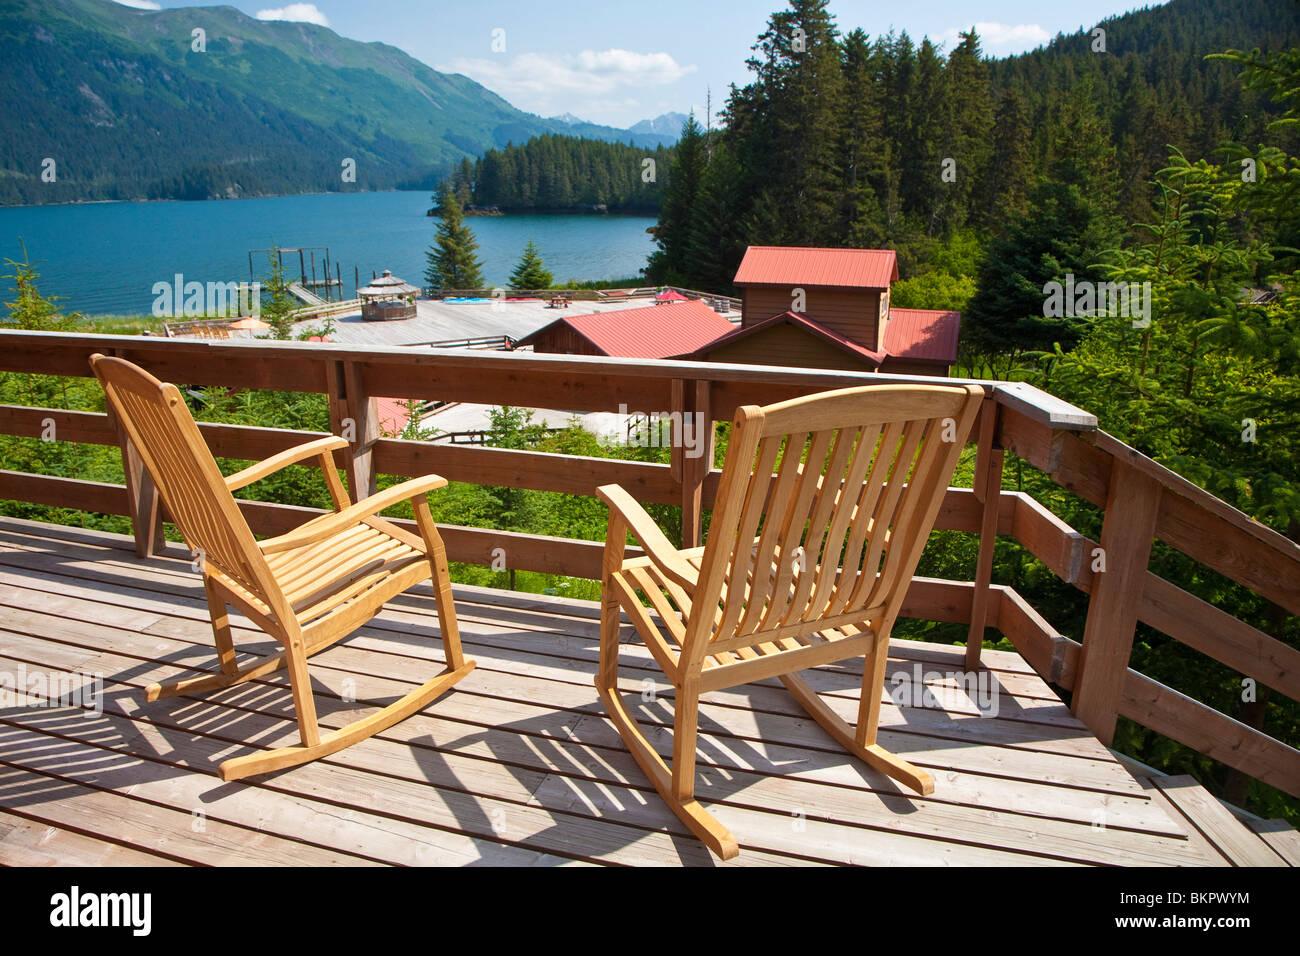 View from the porch of a cabin at Tutka Bay Wilderness Lodge, Kachemak Bay State Park, Kenai Penninsula, Alaska, - Stock Image